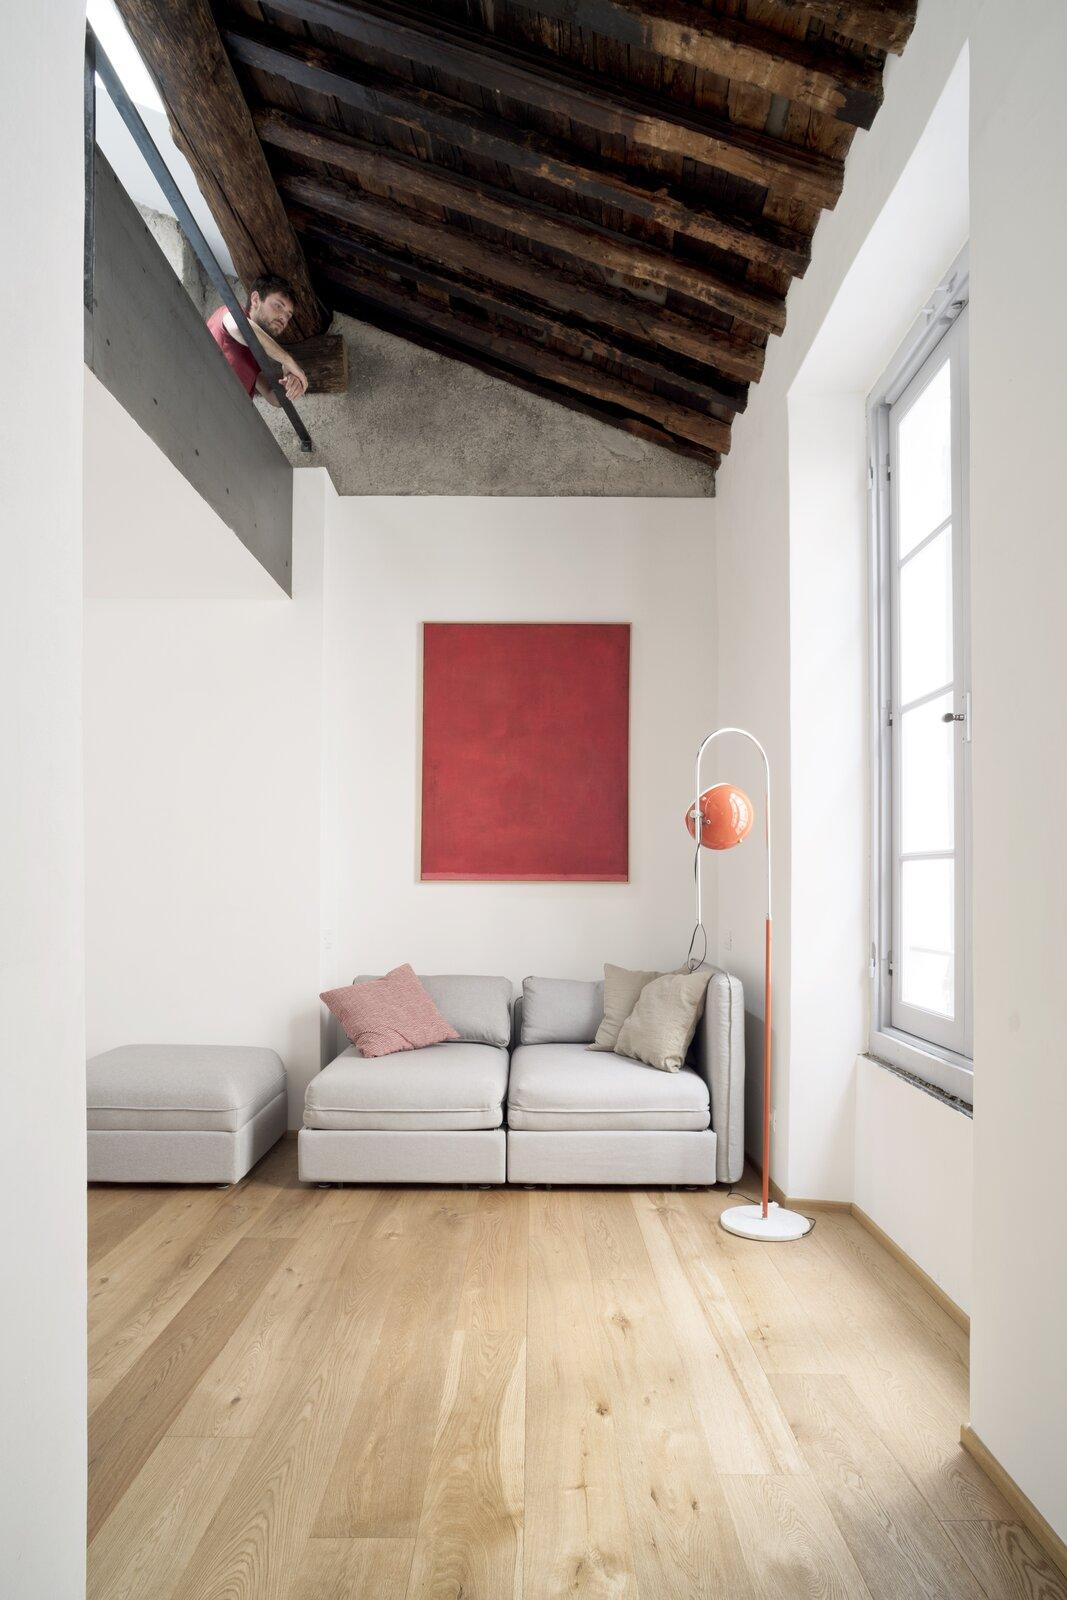 House for a Sea Dog living area